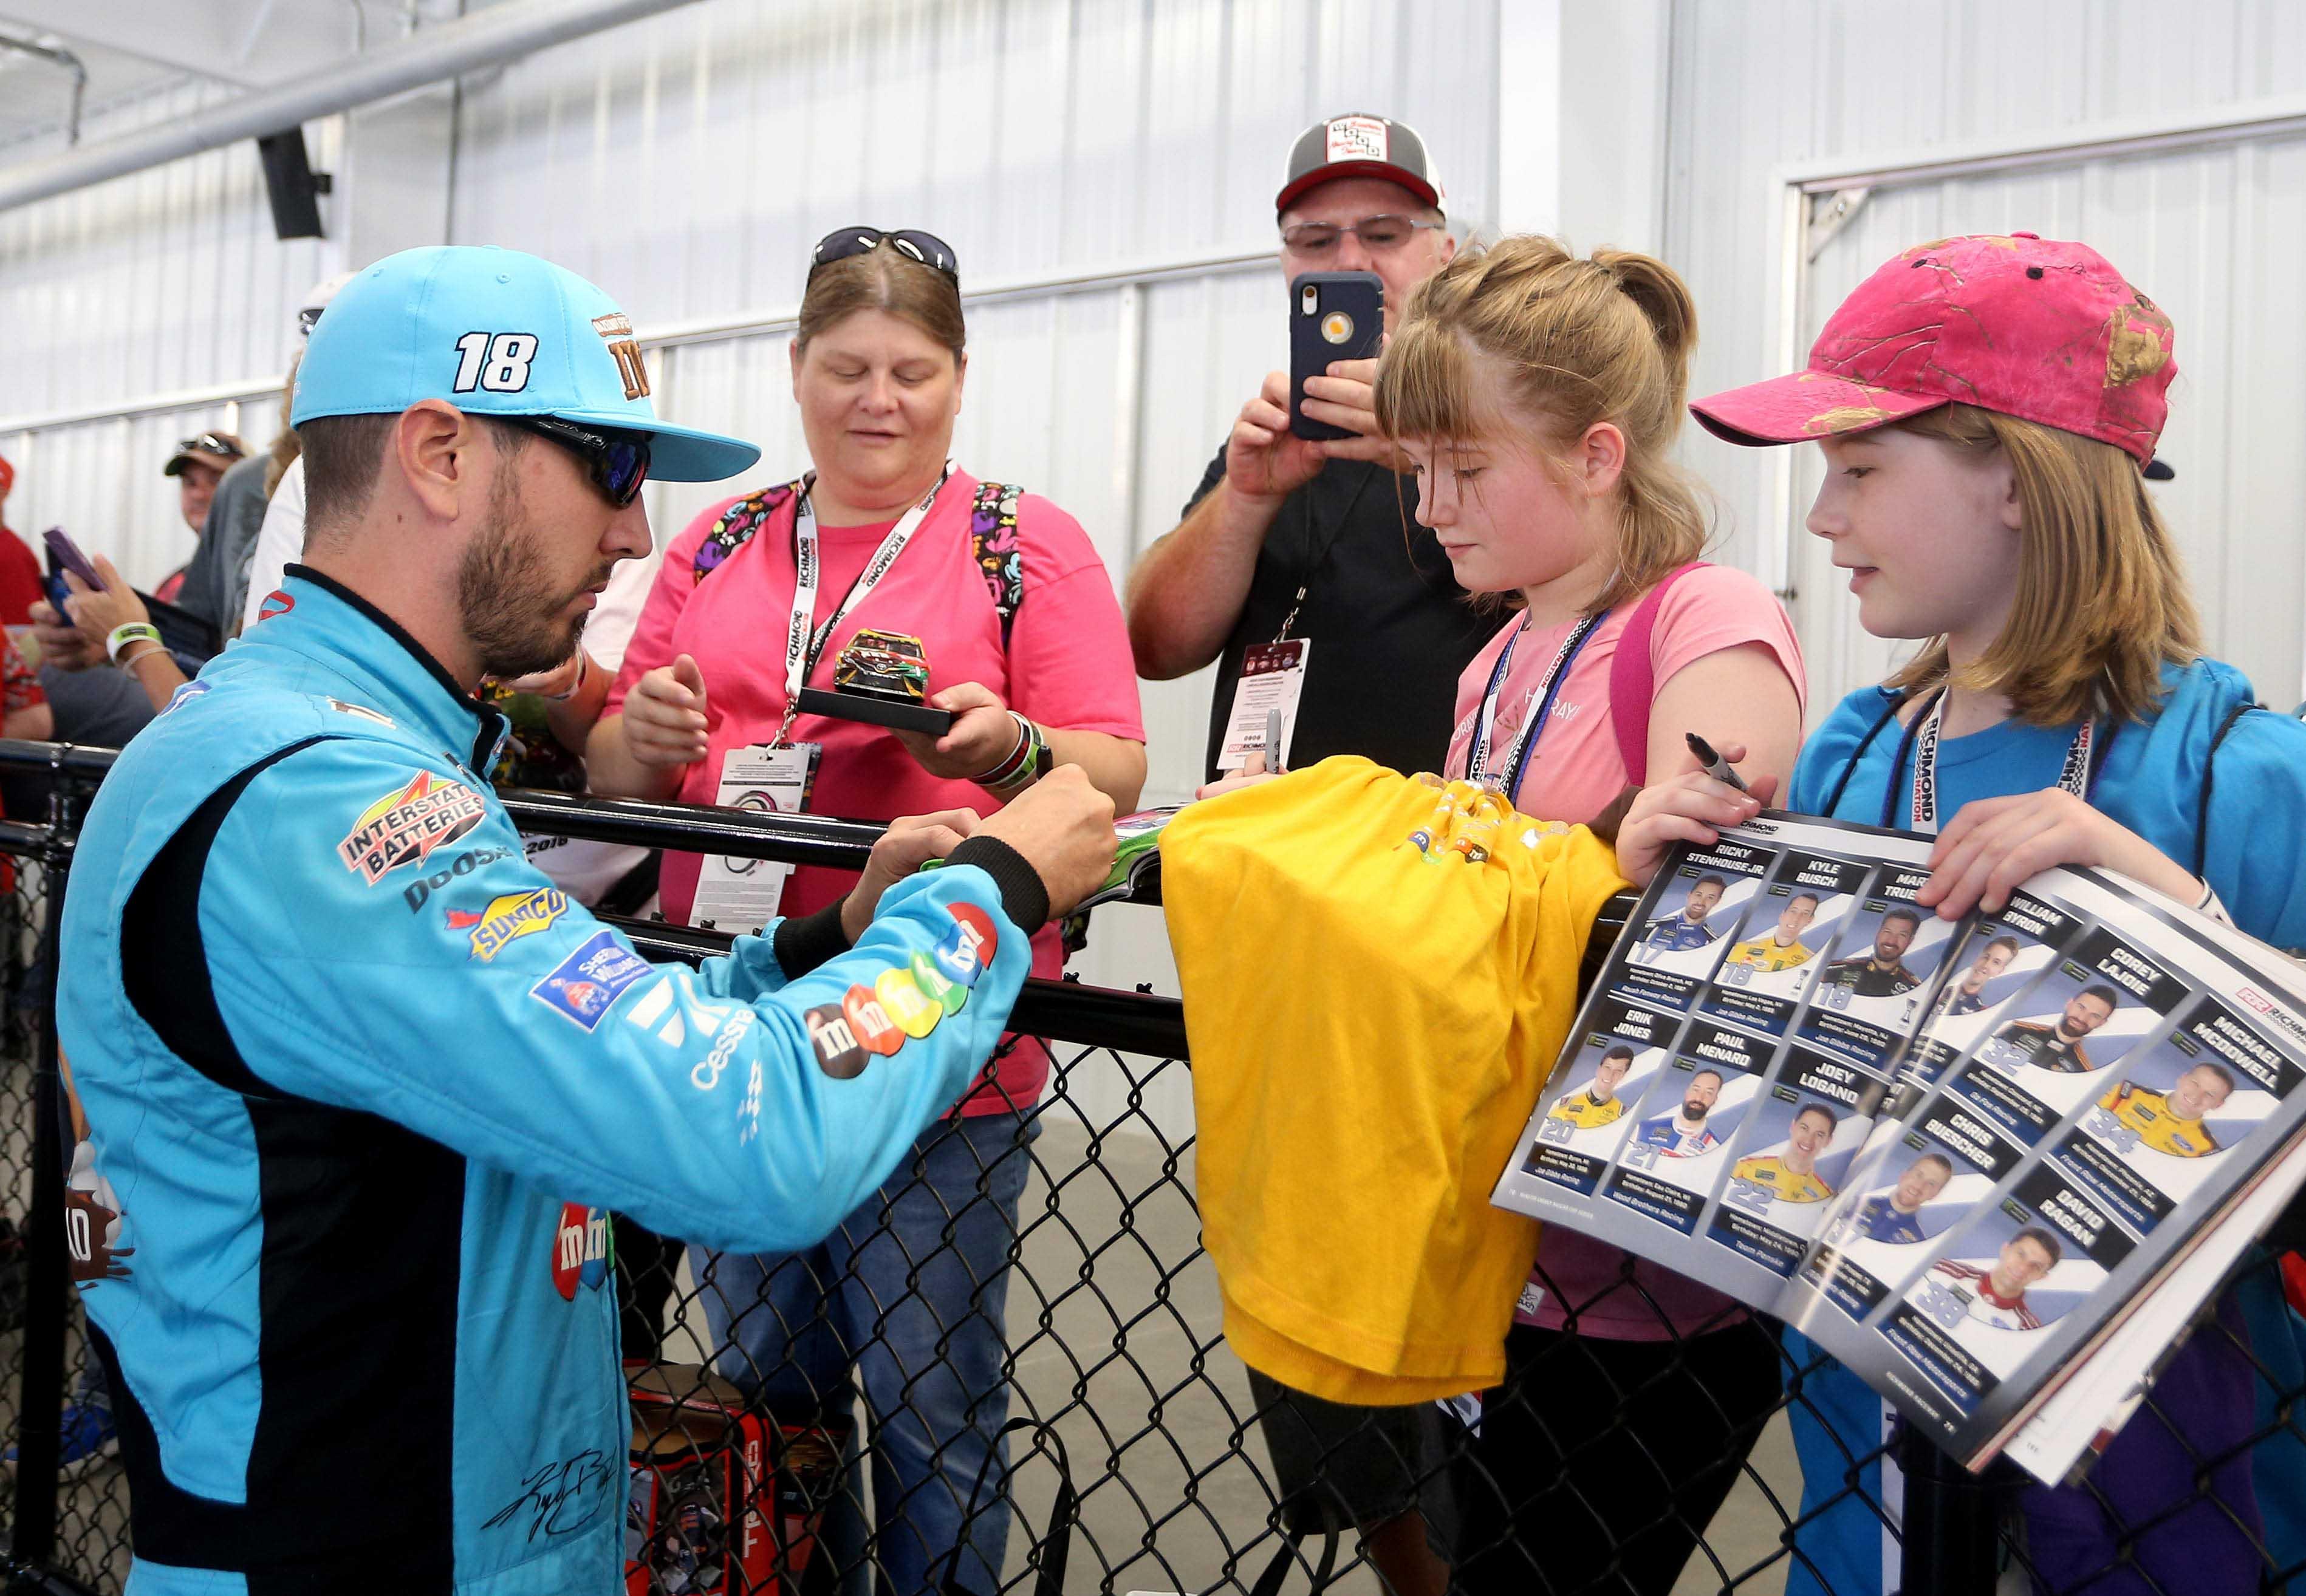 Kyle Busch signs autographs for NASCAR fans at Richmond Raceway